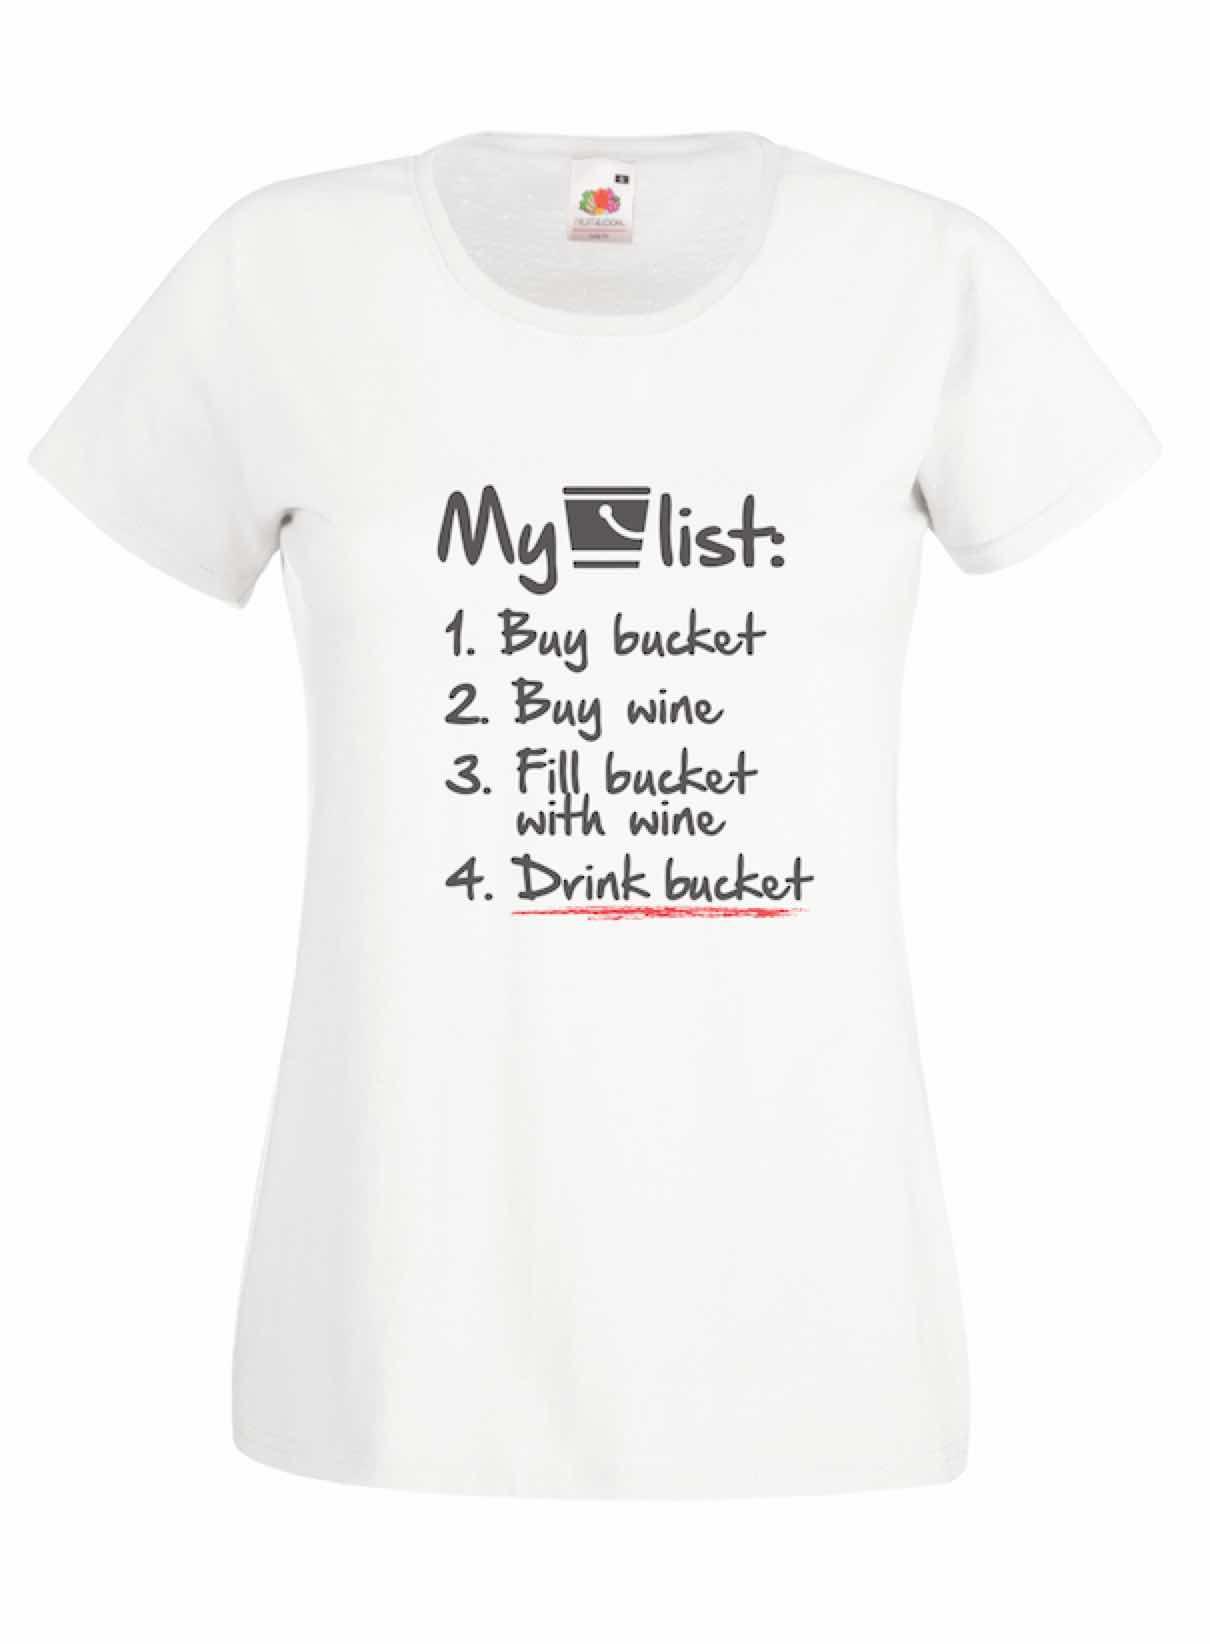 My Bucket List design for t-shirt, hoodie & sweatshirt